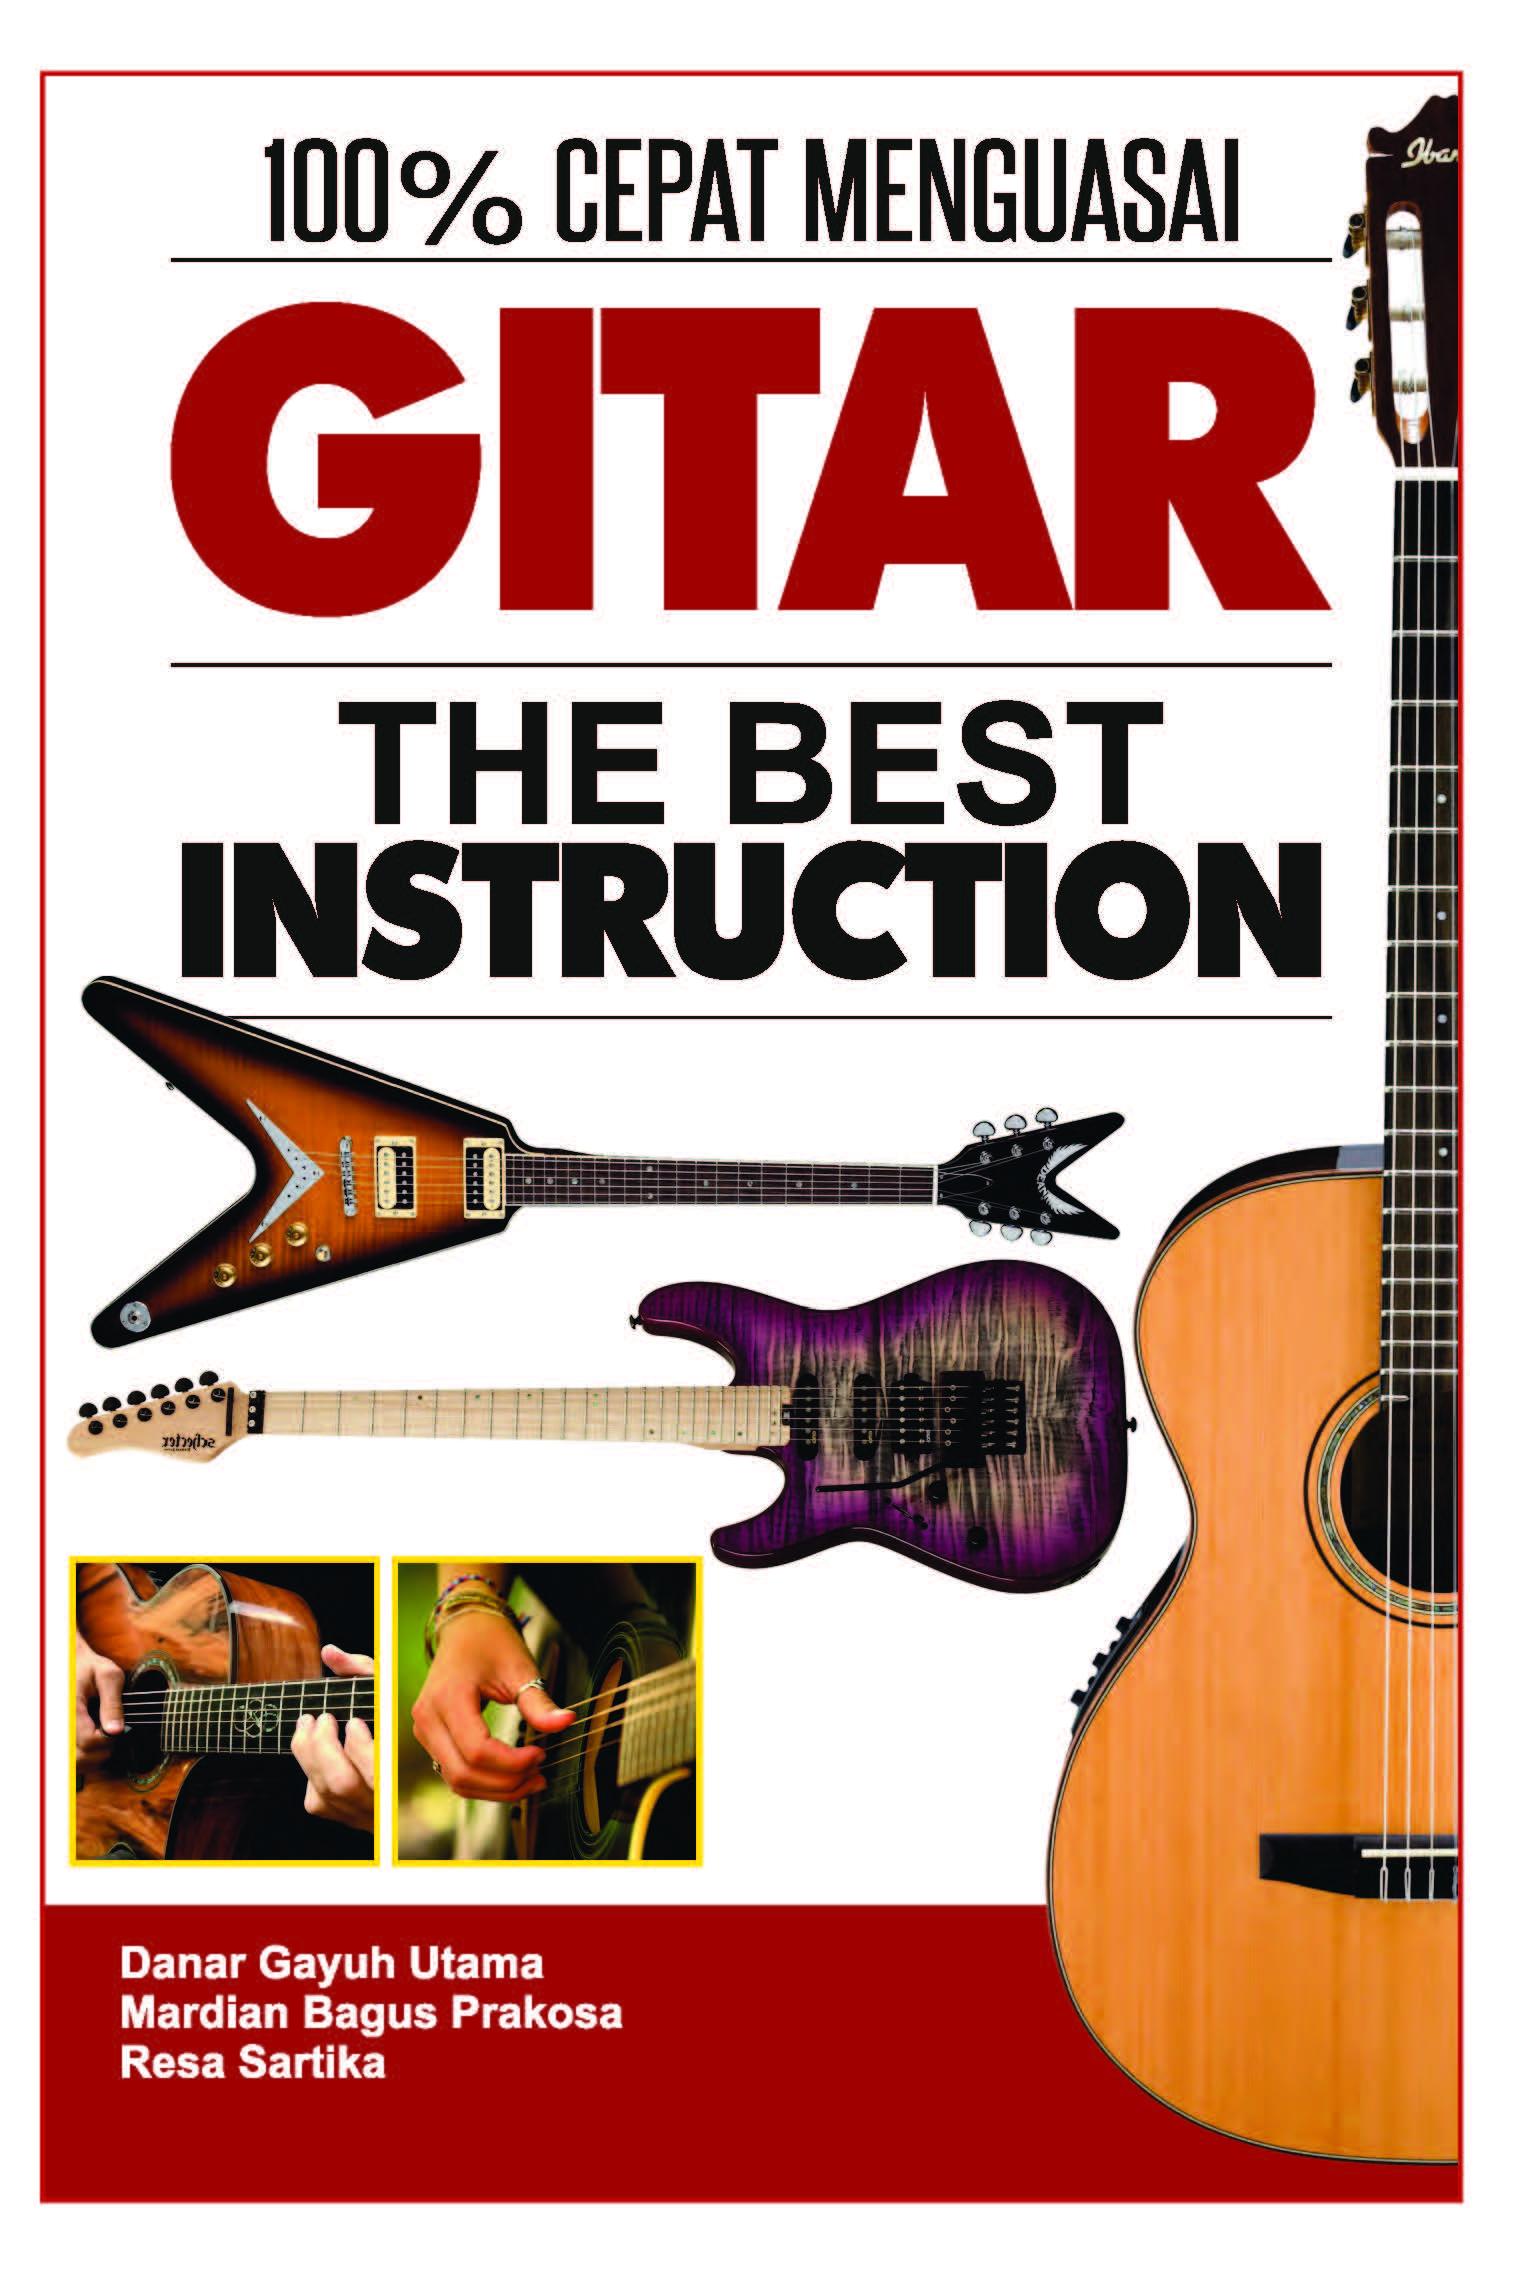 100% cepat menguasai gitar the best instruction [sumber elektronis]